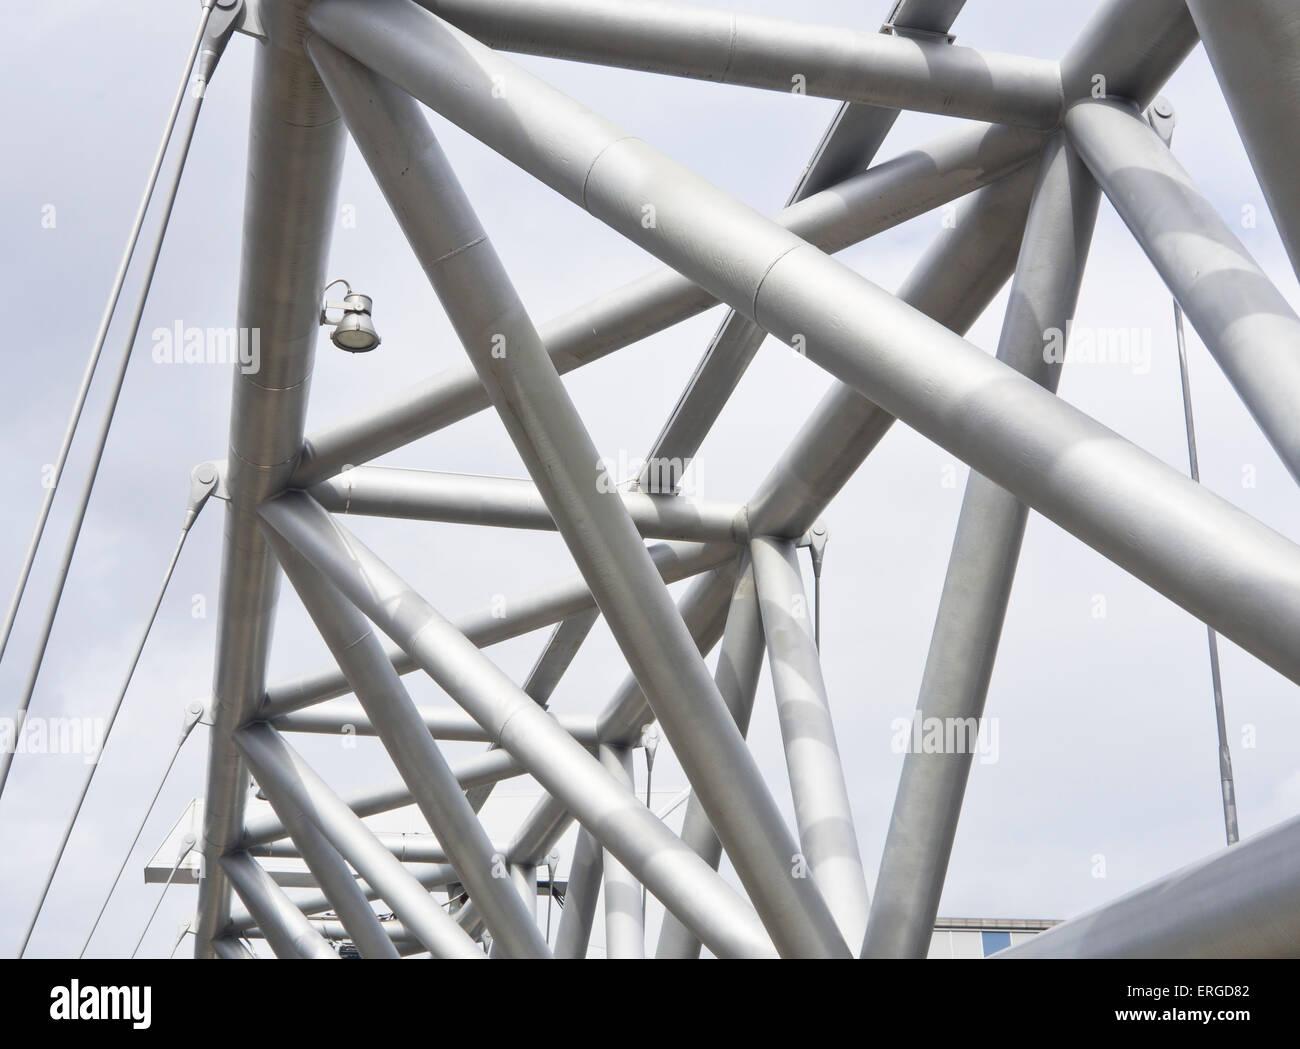 'Akrobaten', the Acrobat imposing and creative footbridge in Oslo Norway awarded the European Award for - Stock Image